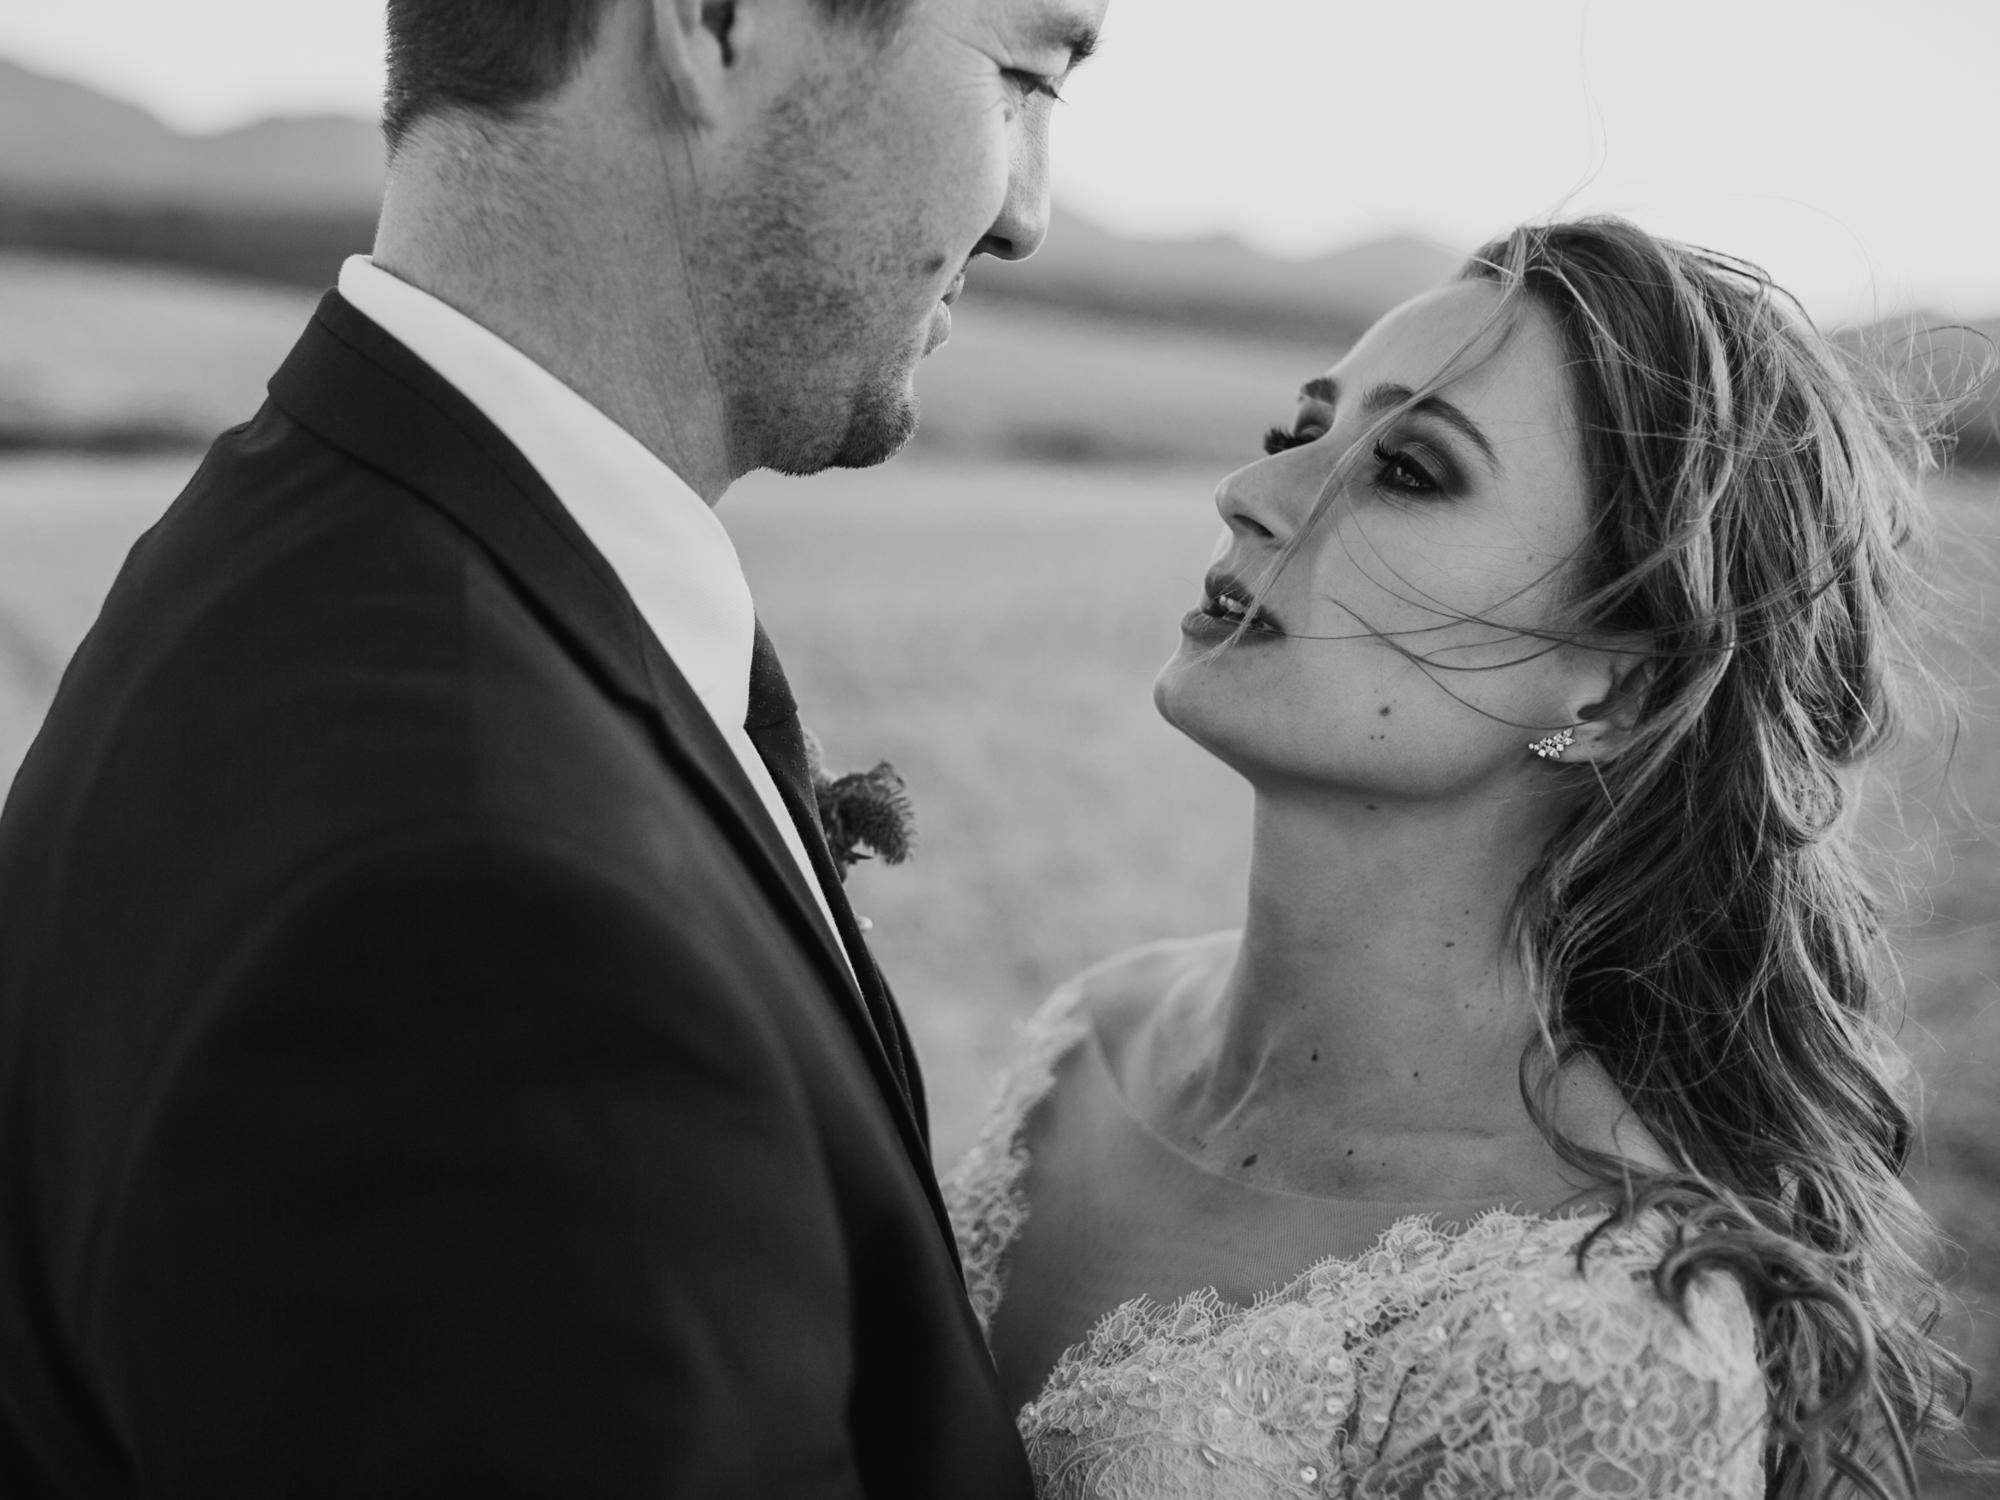 heisvisual-wedding-photographers-documentary-stellenbosch-south-africa001.jpg